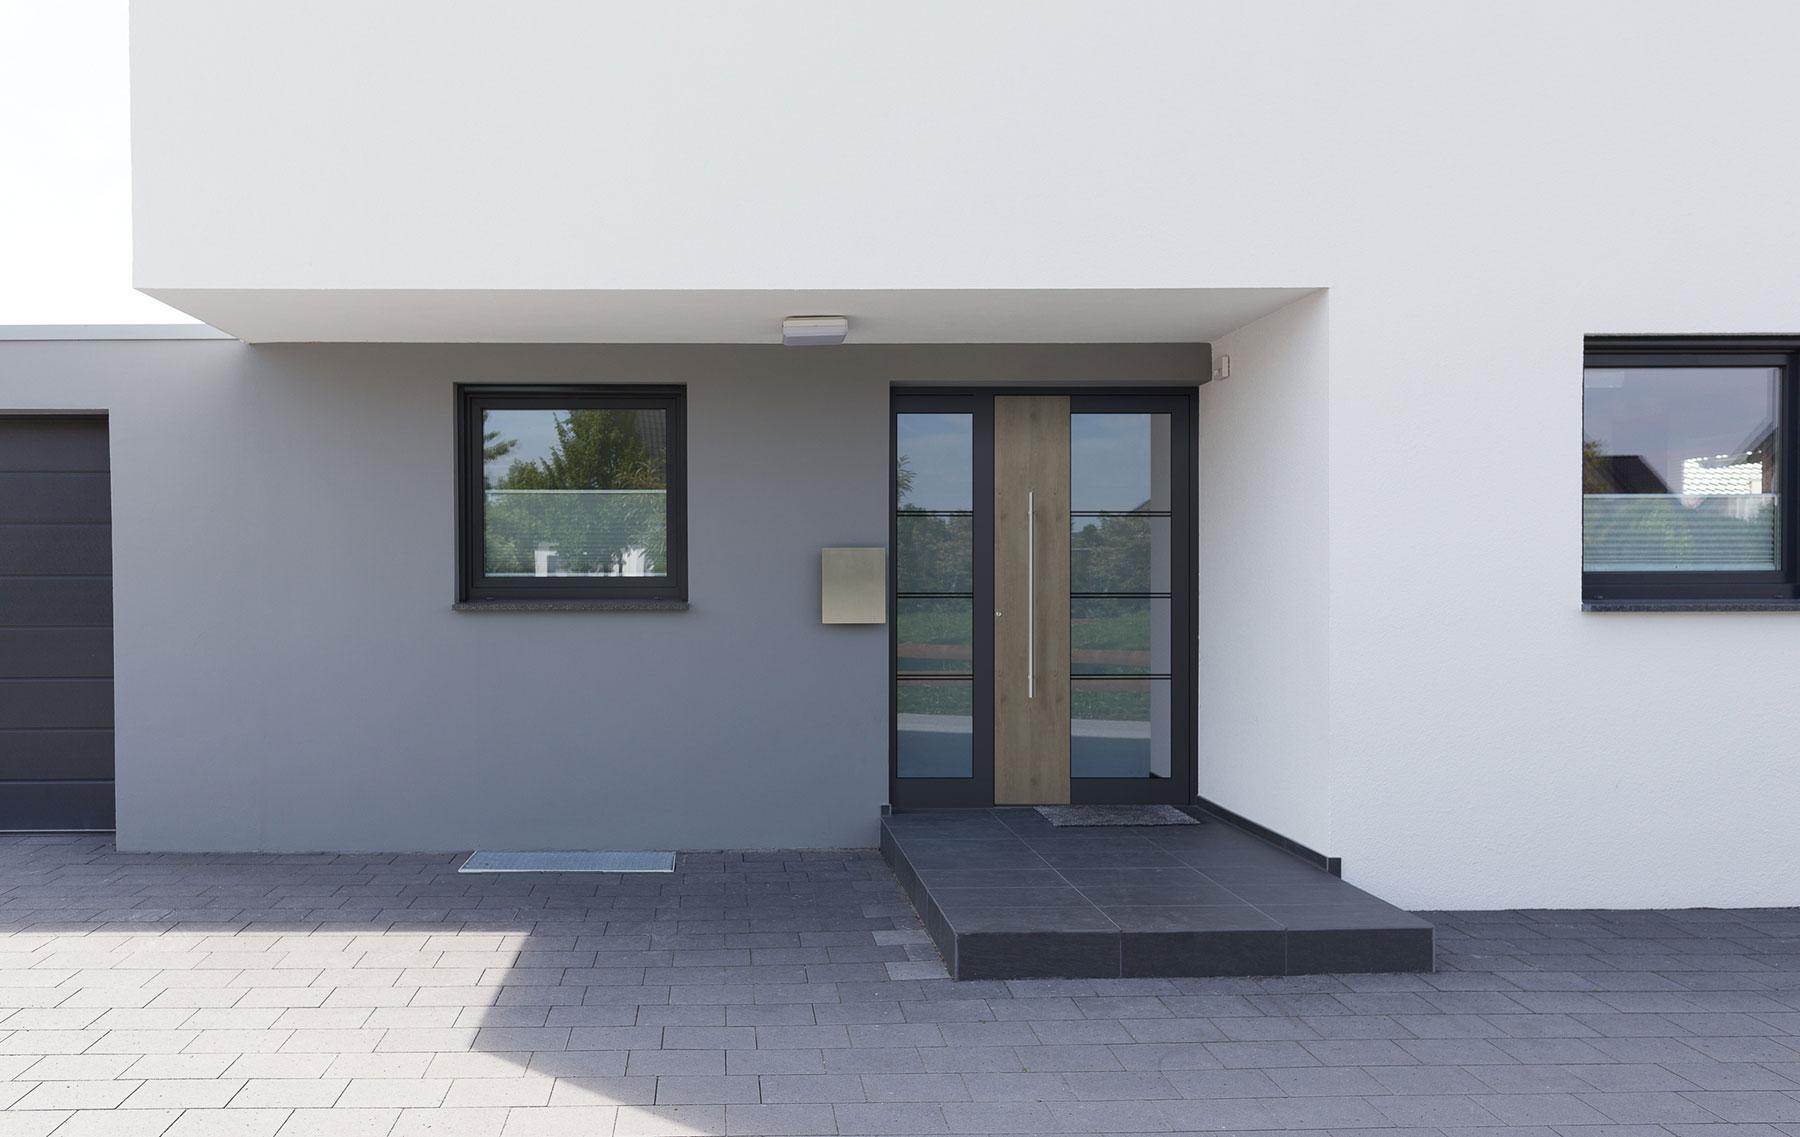 KOMPOtherm-aluminium-door_M3400_27